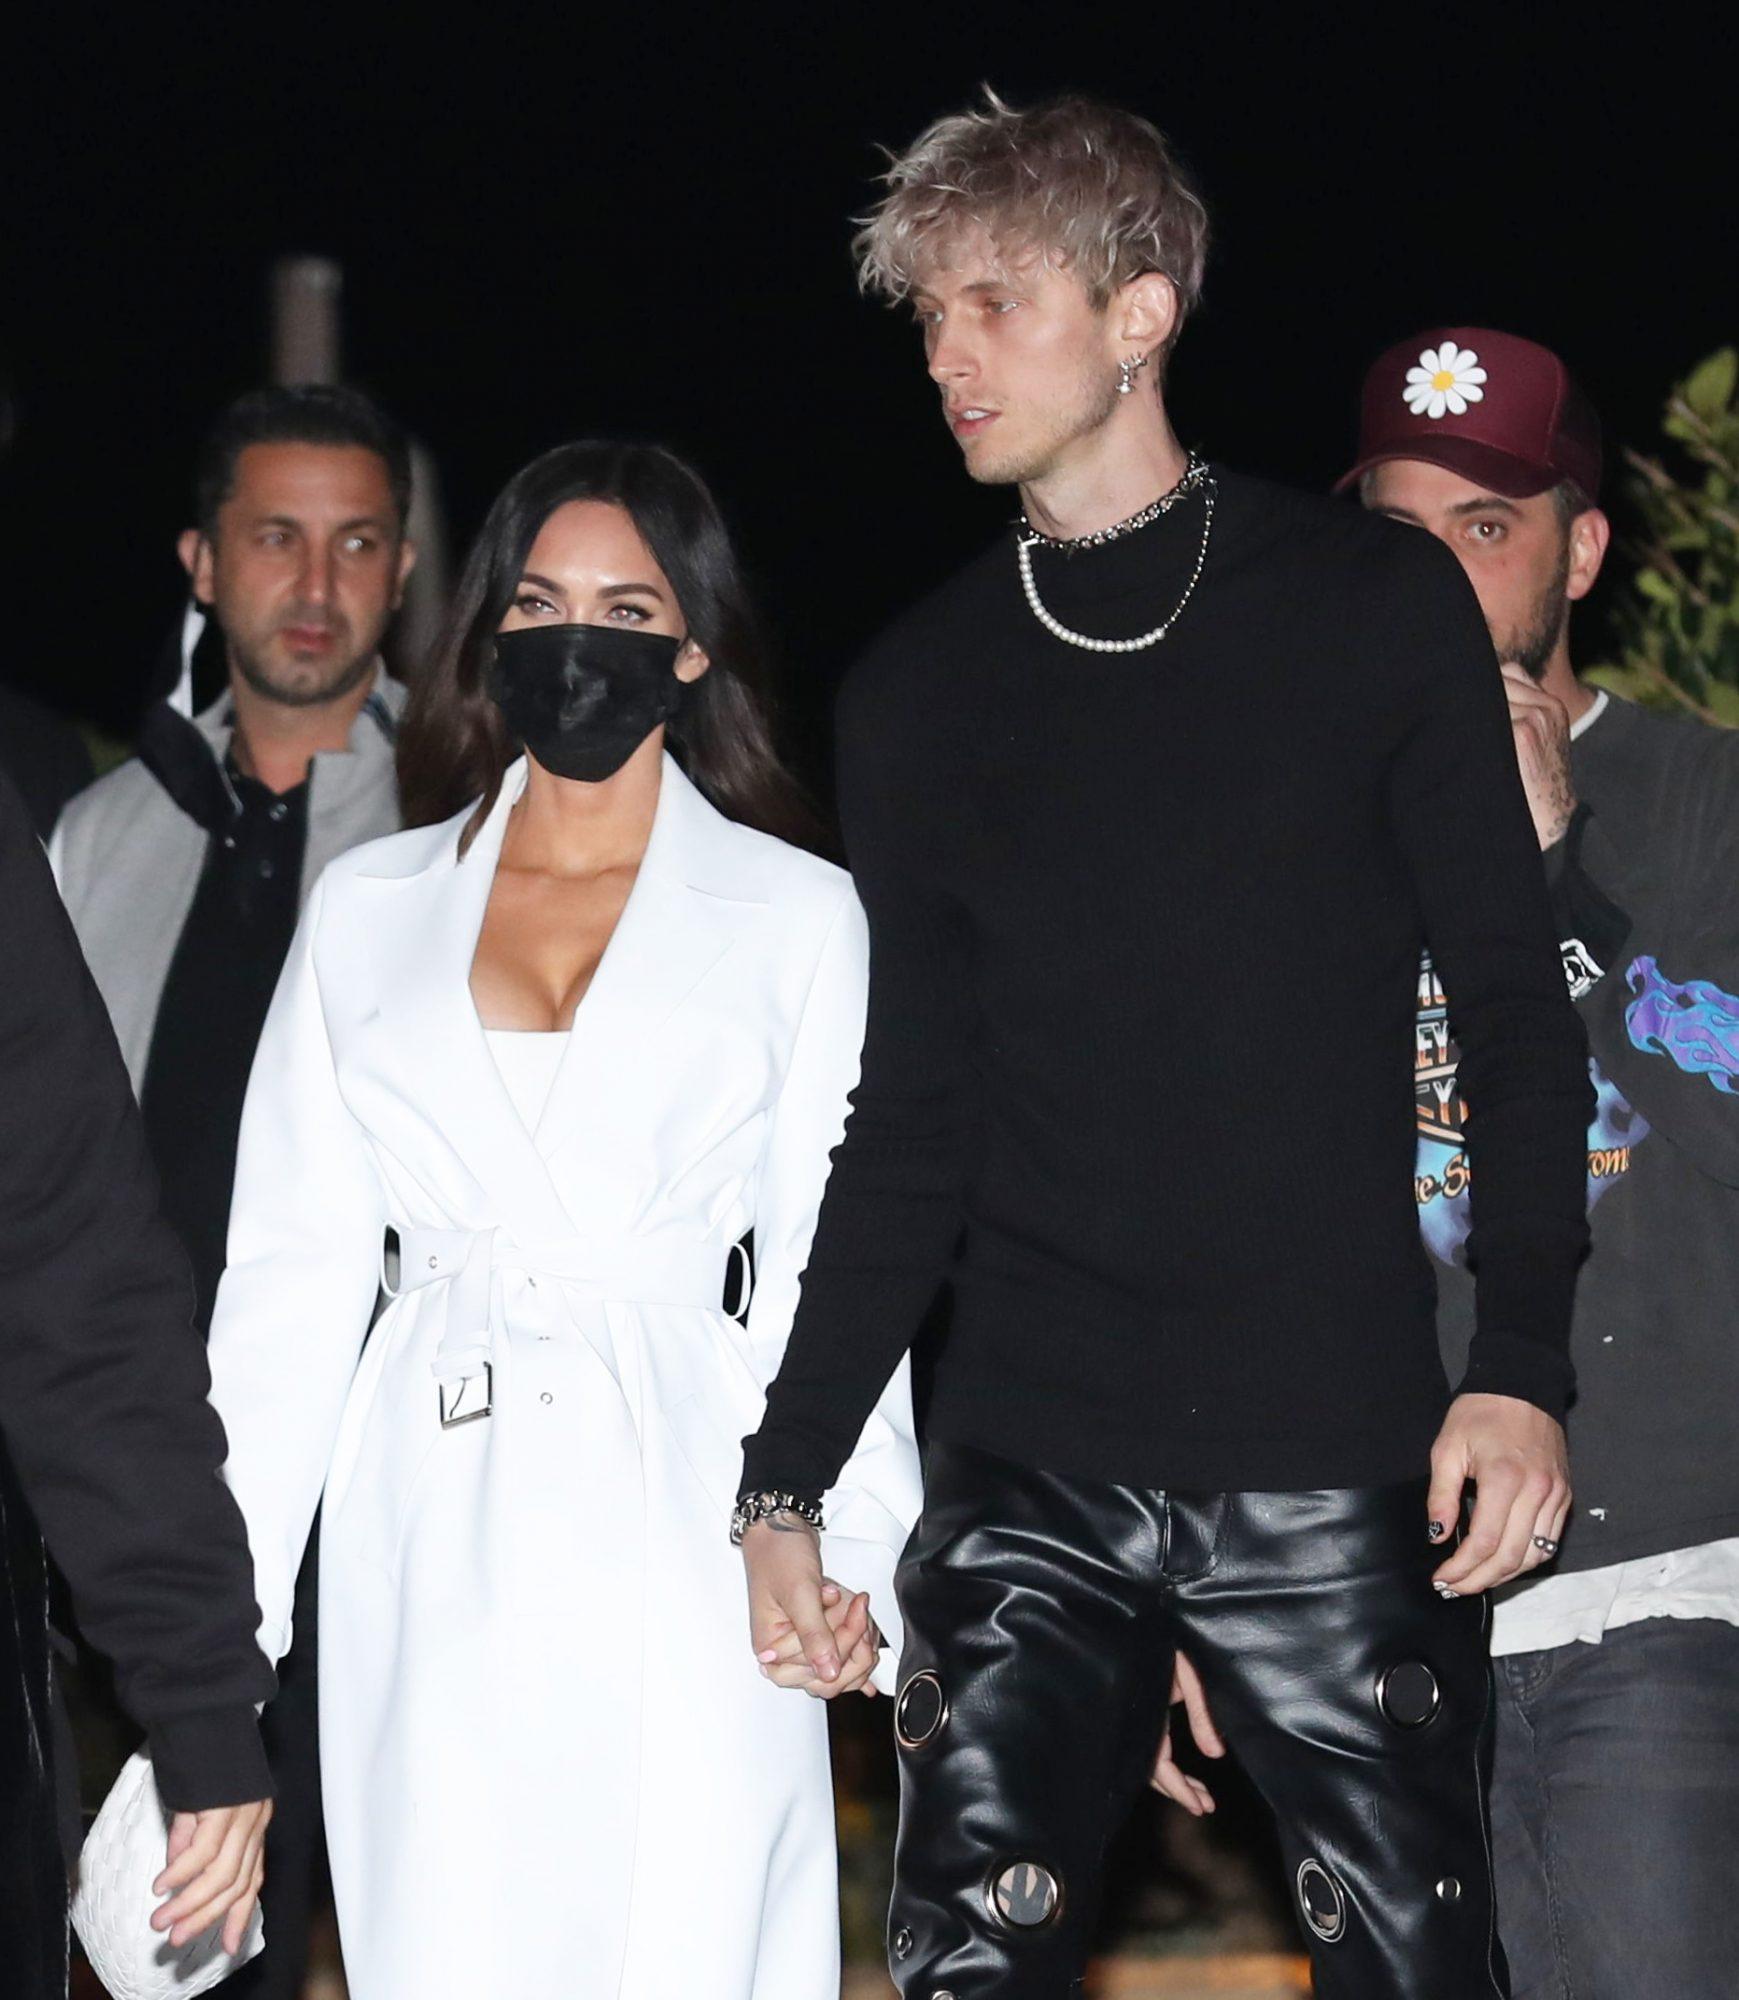 Megan Fox & Machine Gun Kelly Enjoy a Romantic Dinner Date in Malibu